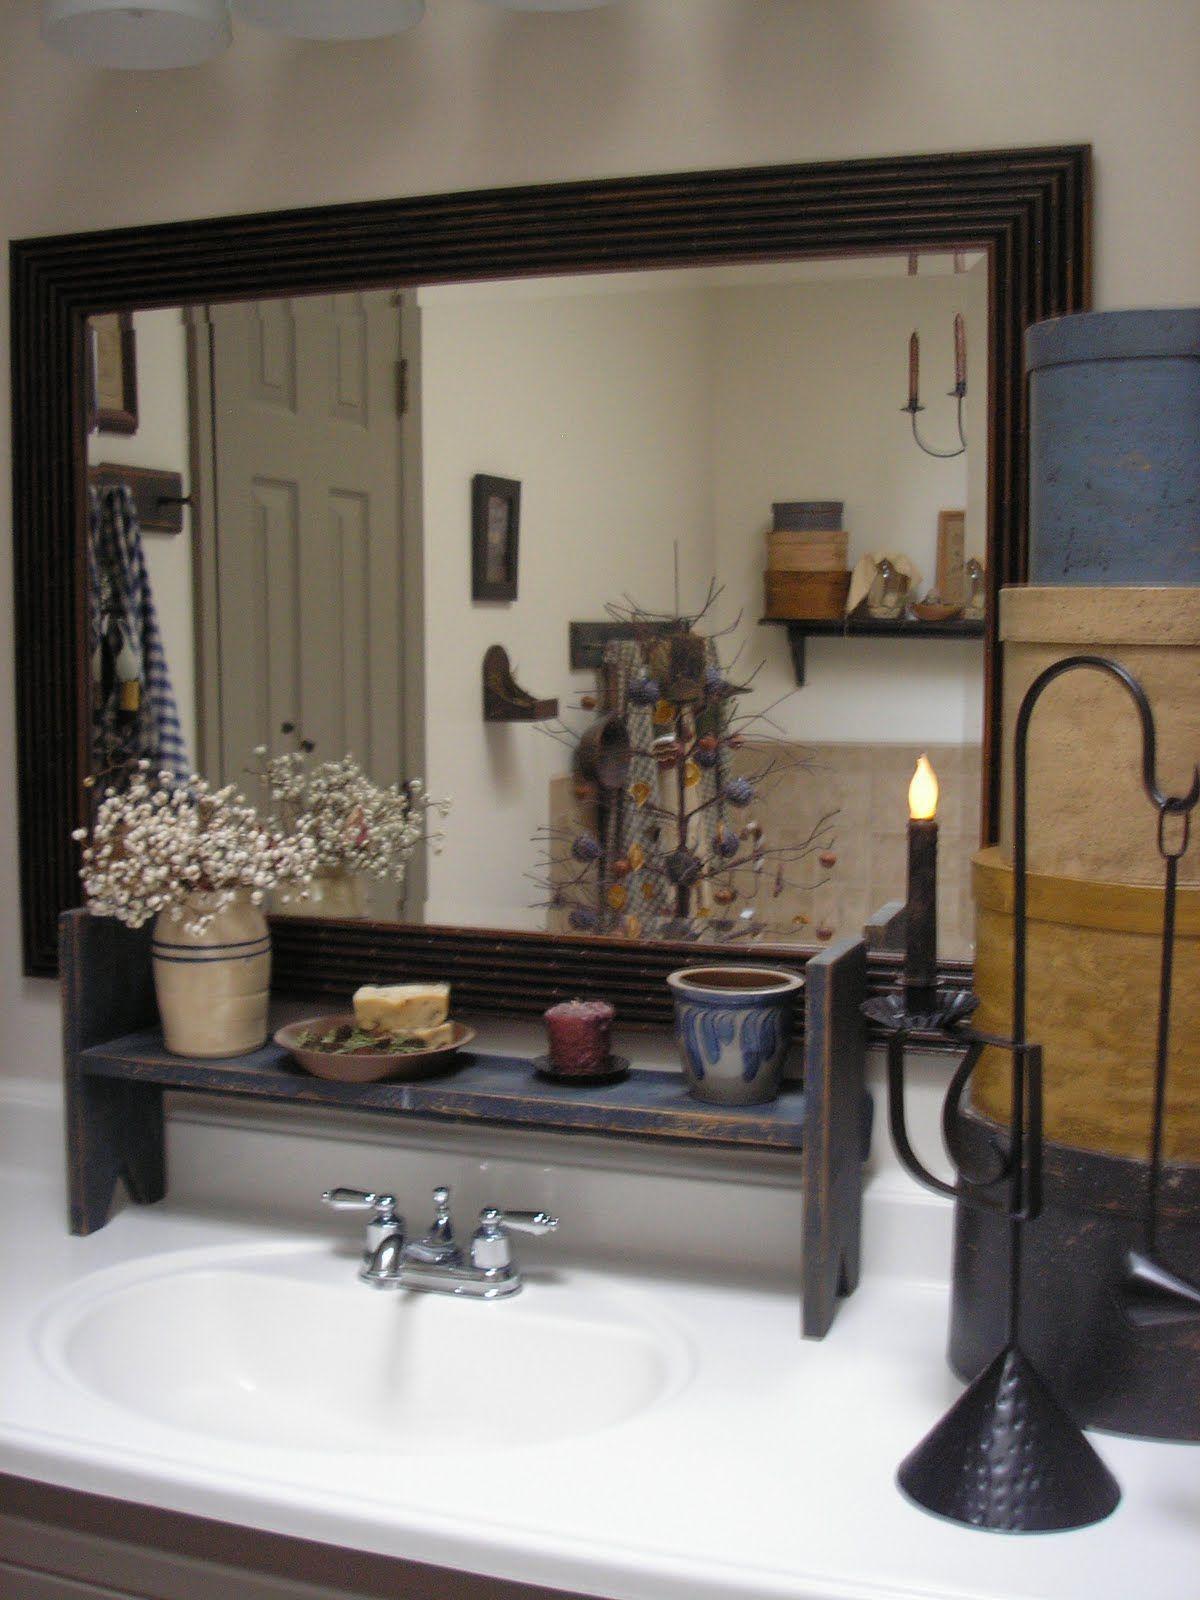 taylors*farmhouse*attic: My bedroom and bath ready for ...